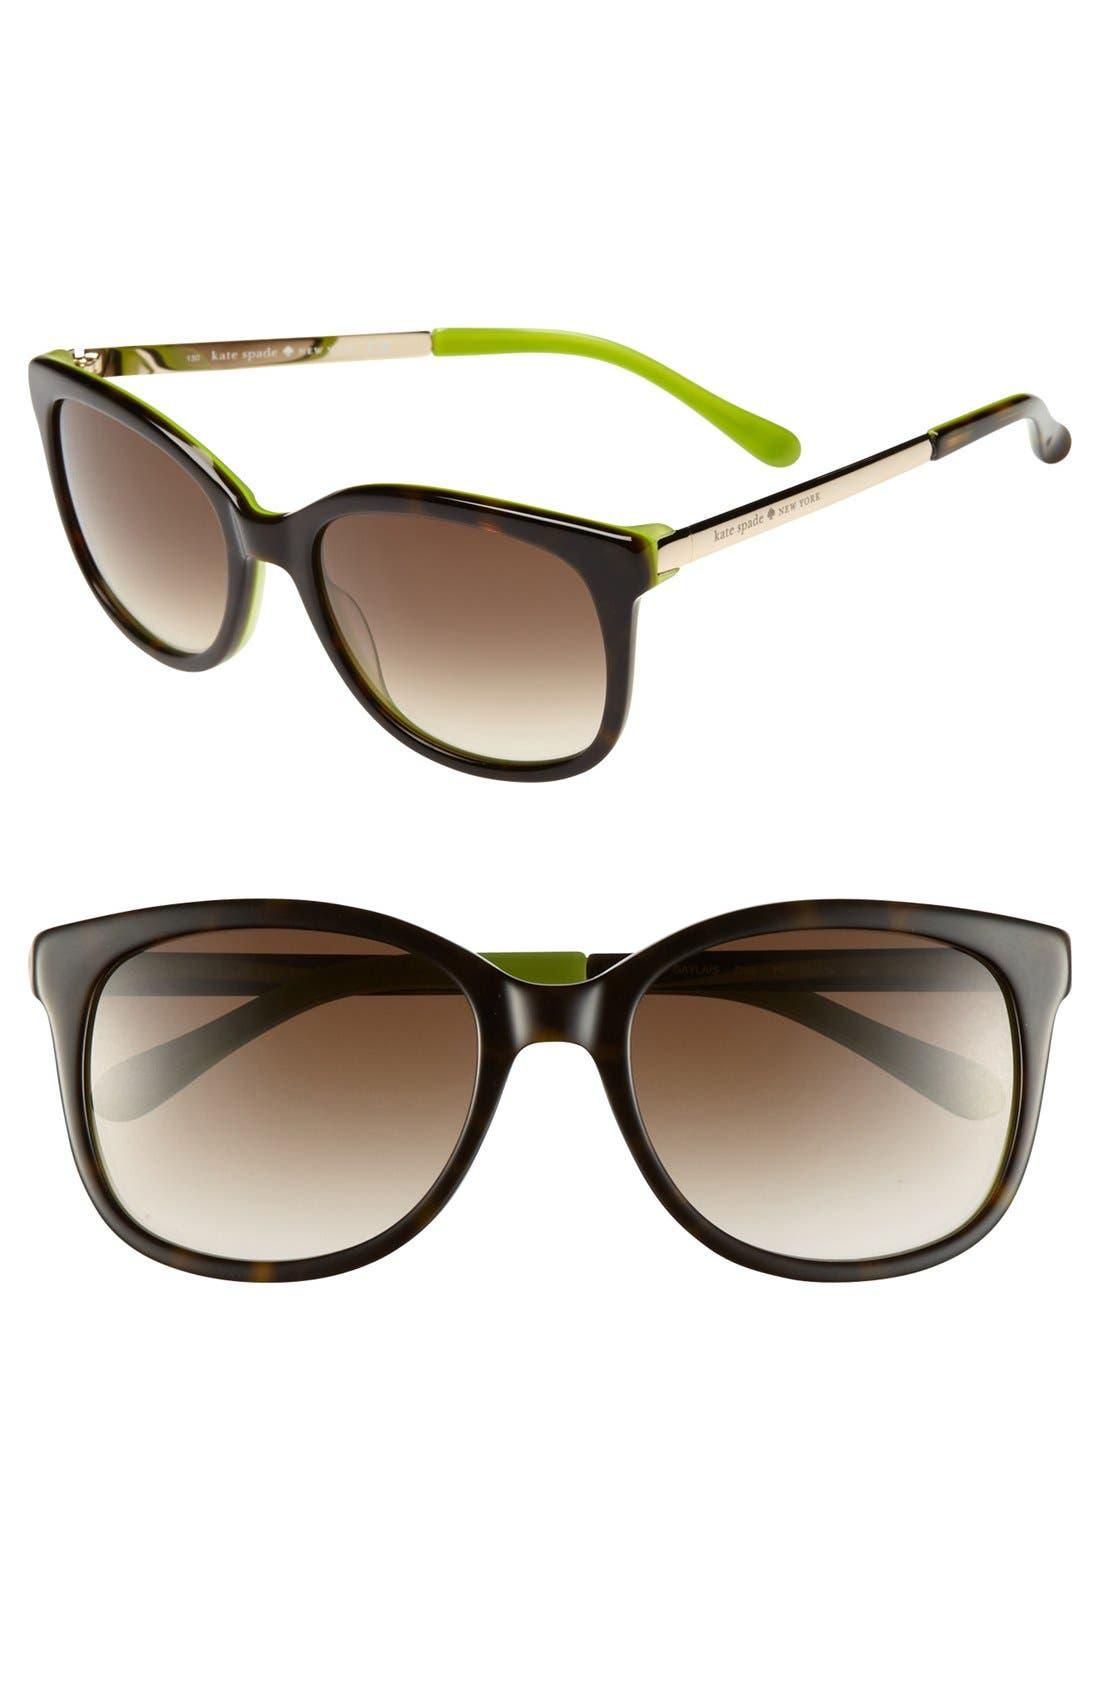 Alternate Image 1 Selected - kate spade new york 'gayla' 52mm sunglasses